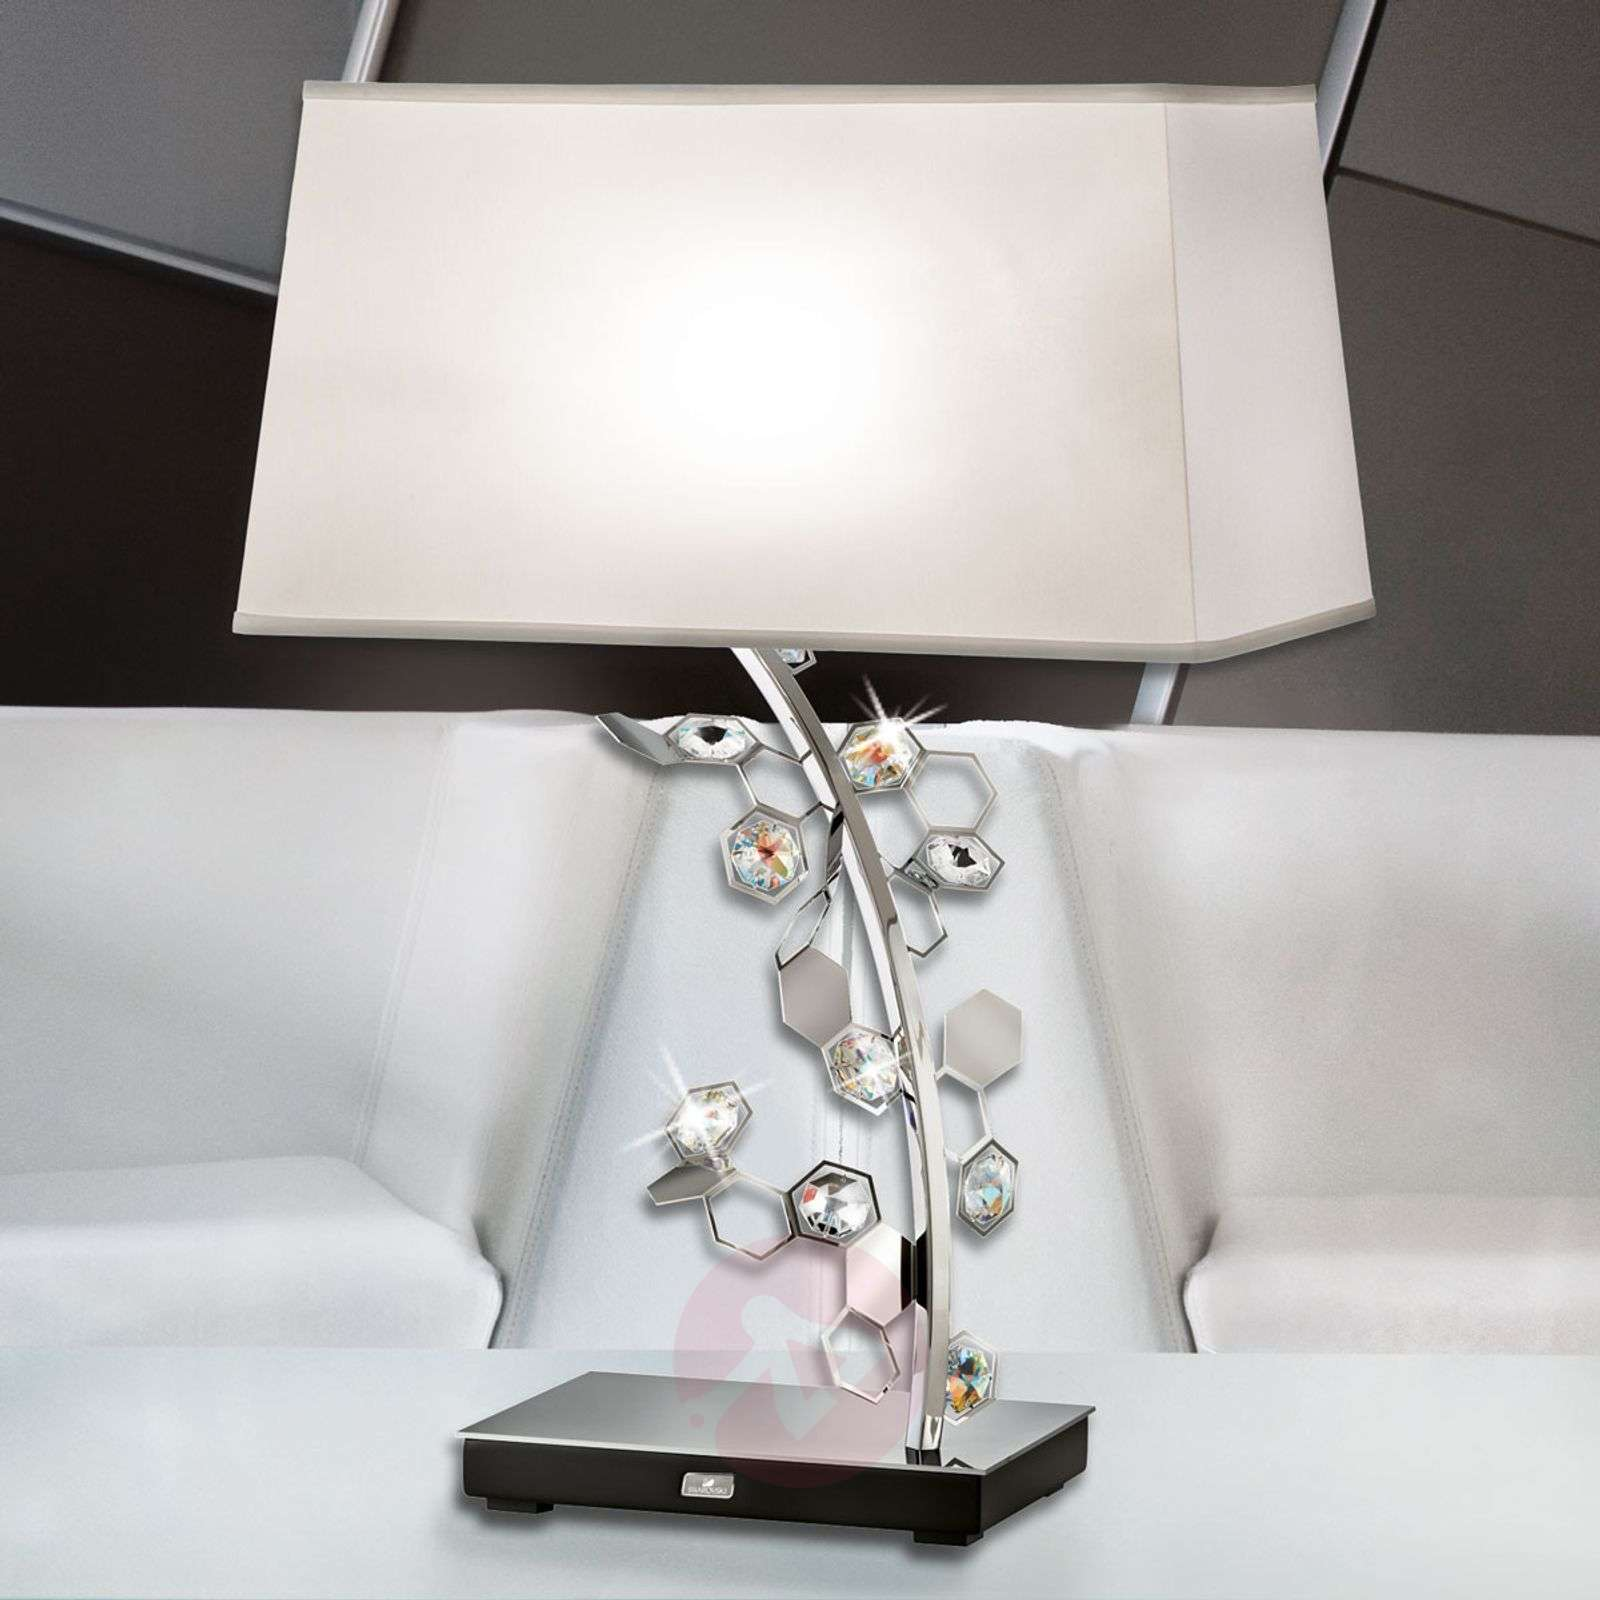 Crystalon table lamp with Swarovski crystals-8578025-07